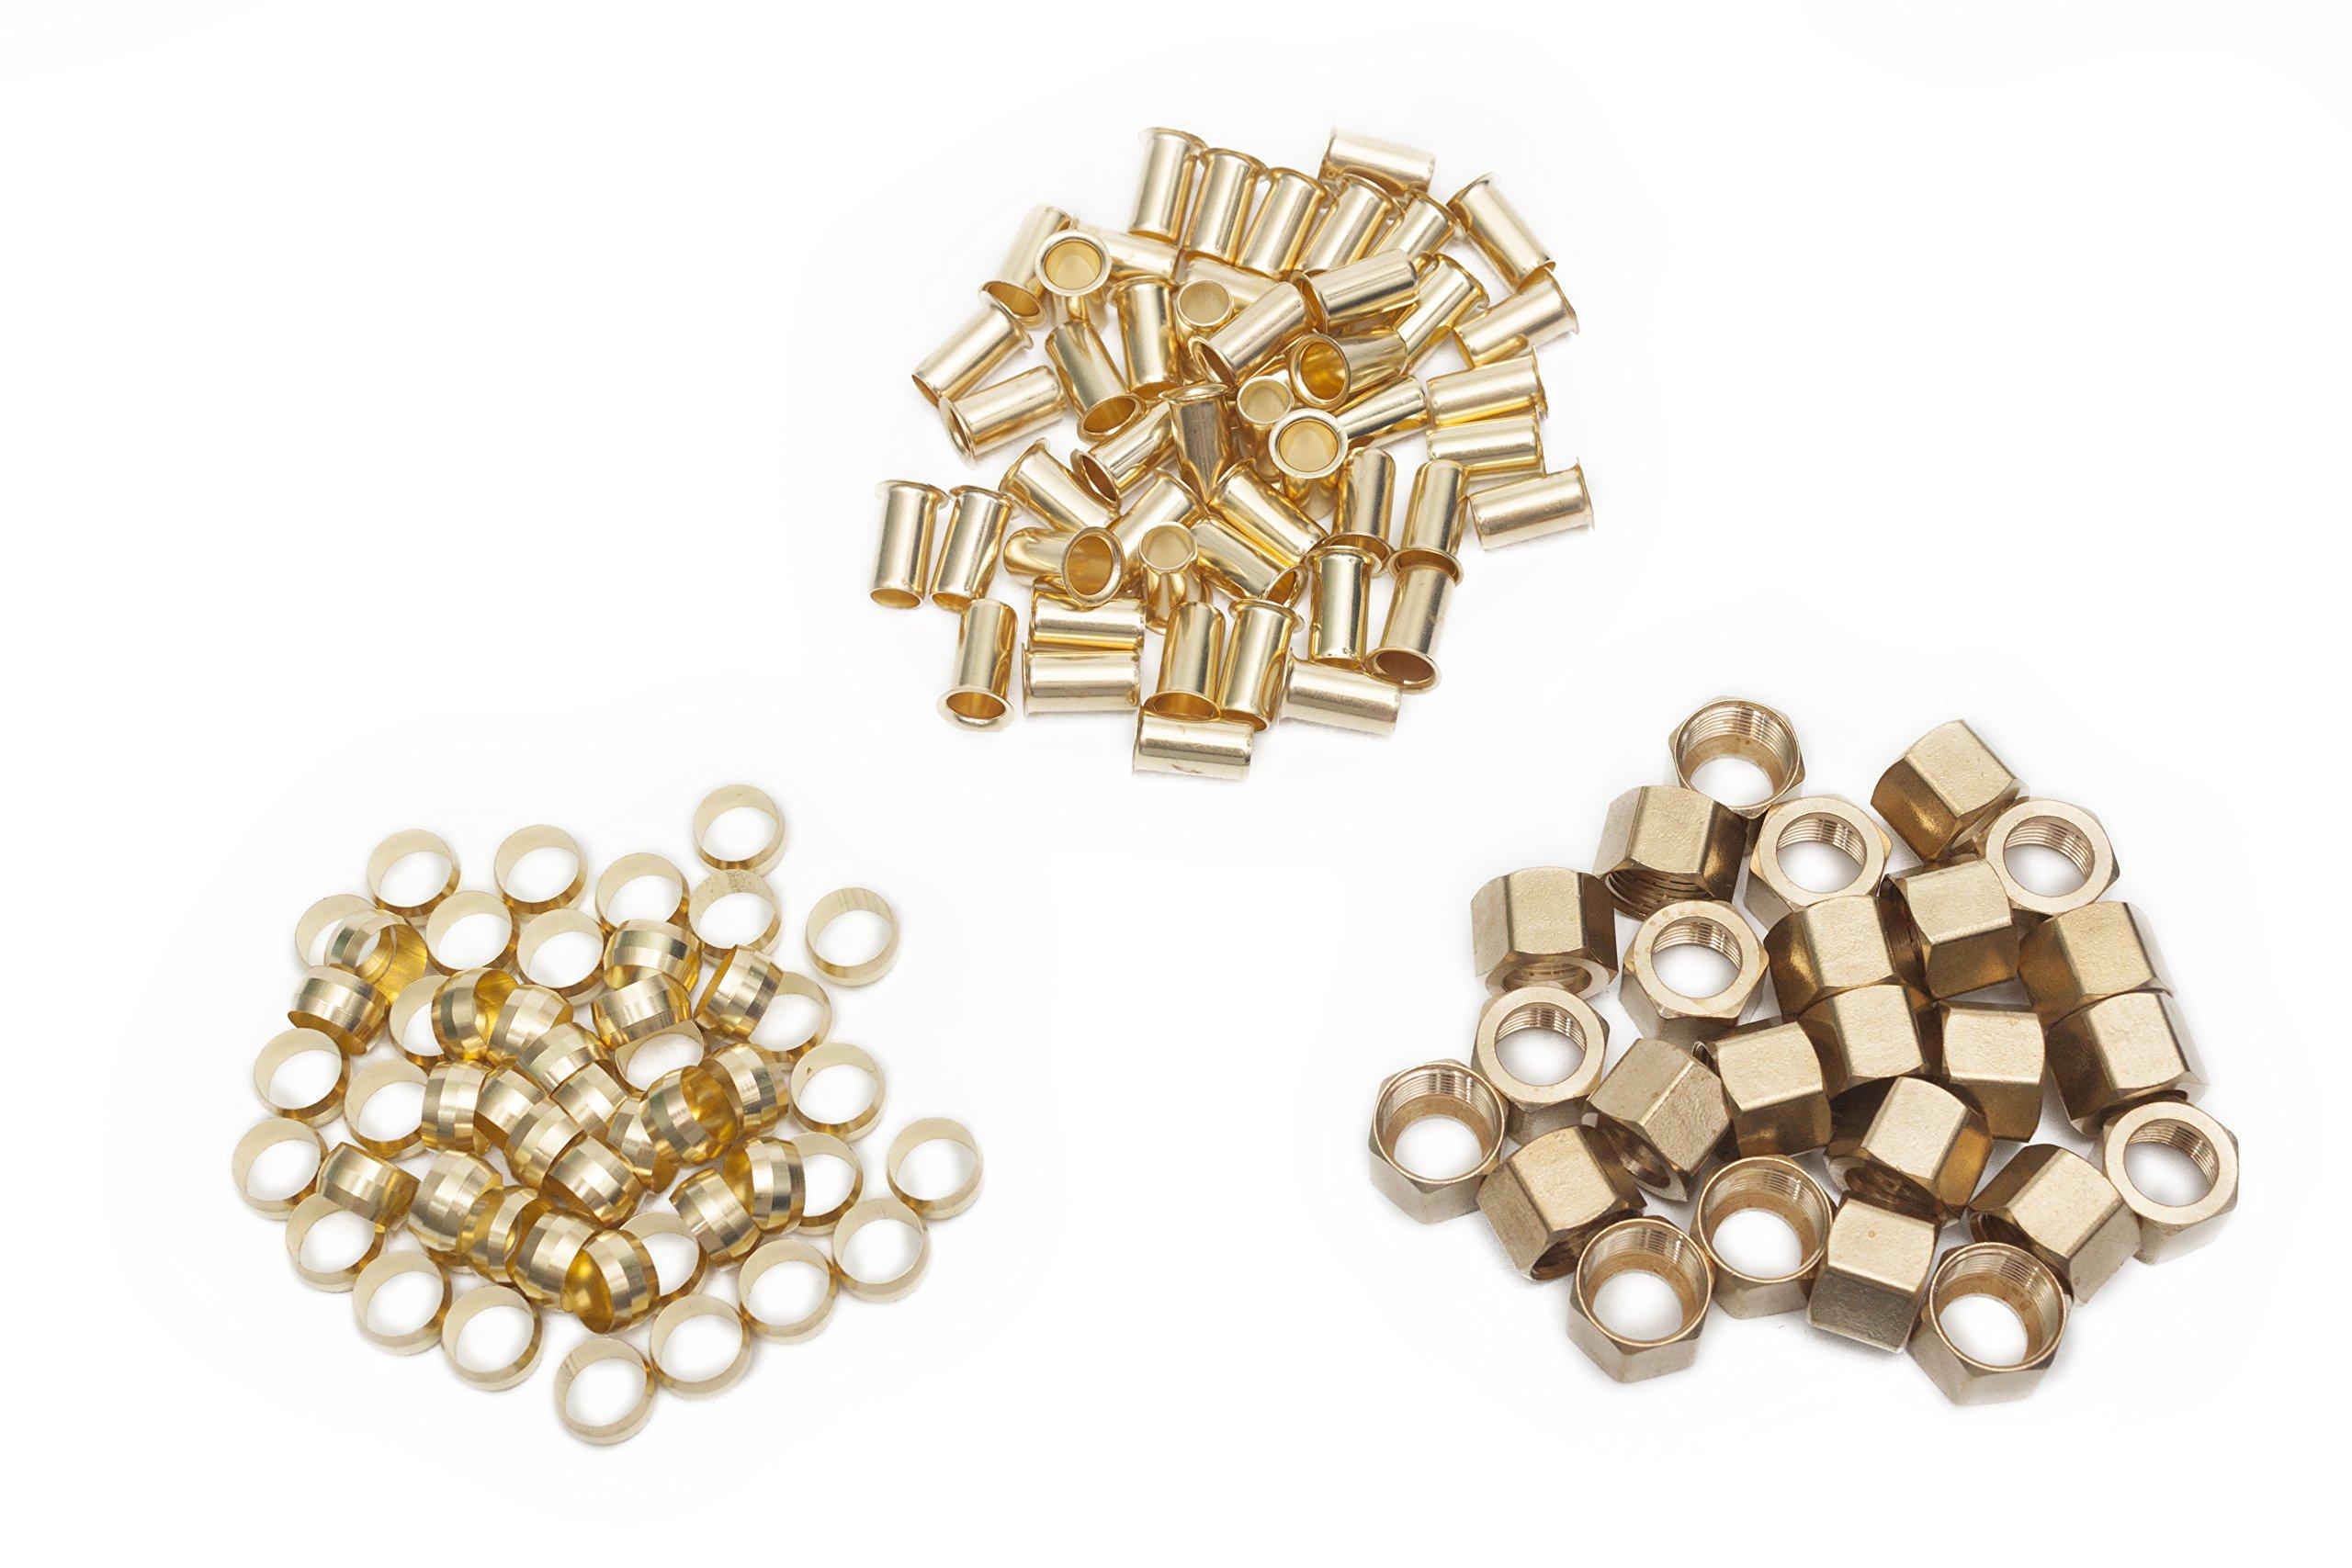 LTWFITTING Value Pack 1/2'' OD Brass Compression Insert,Sleeve Ferrule,Nut (Pack of 125)